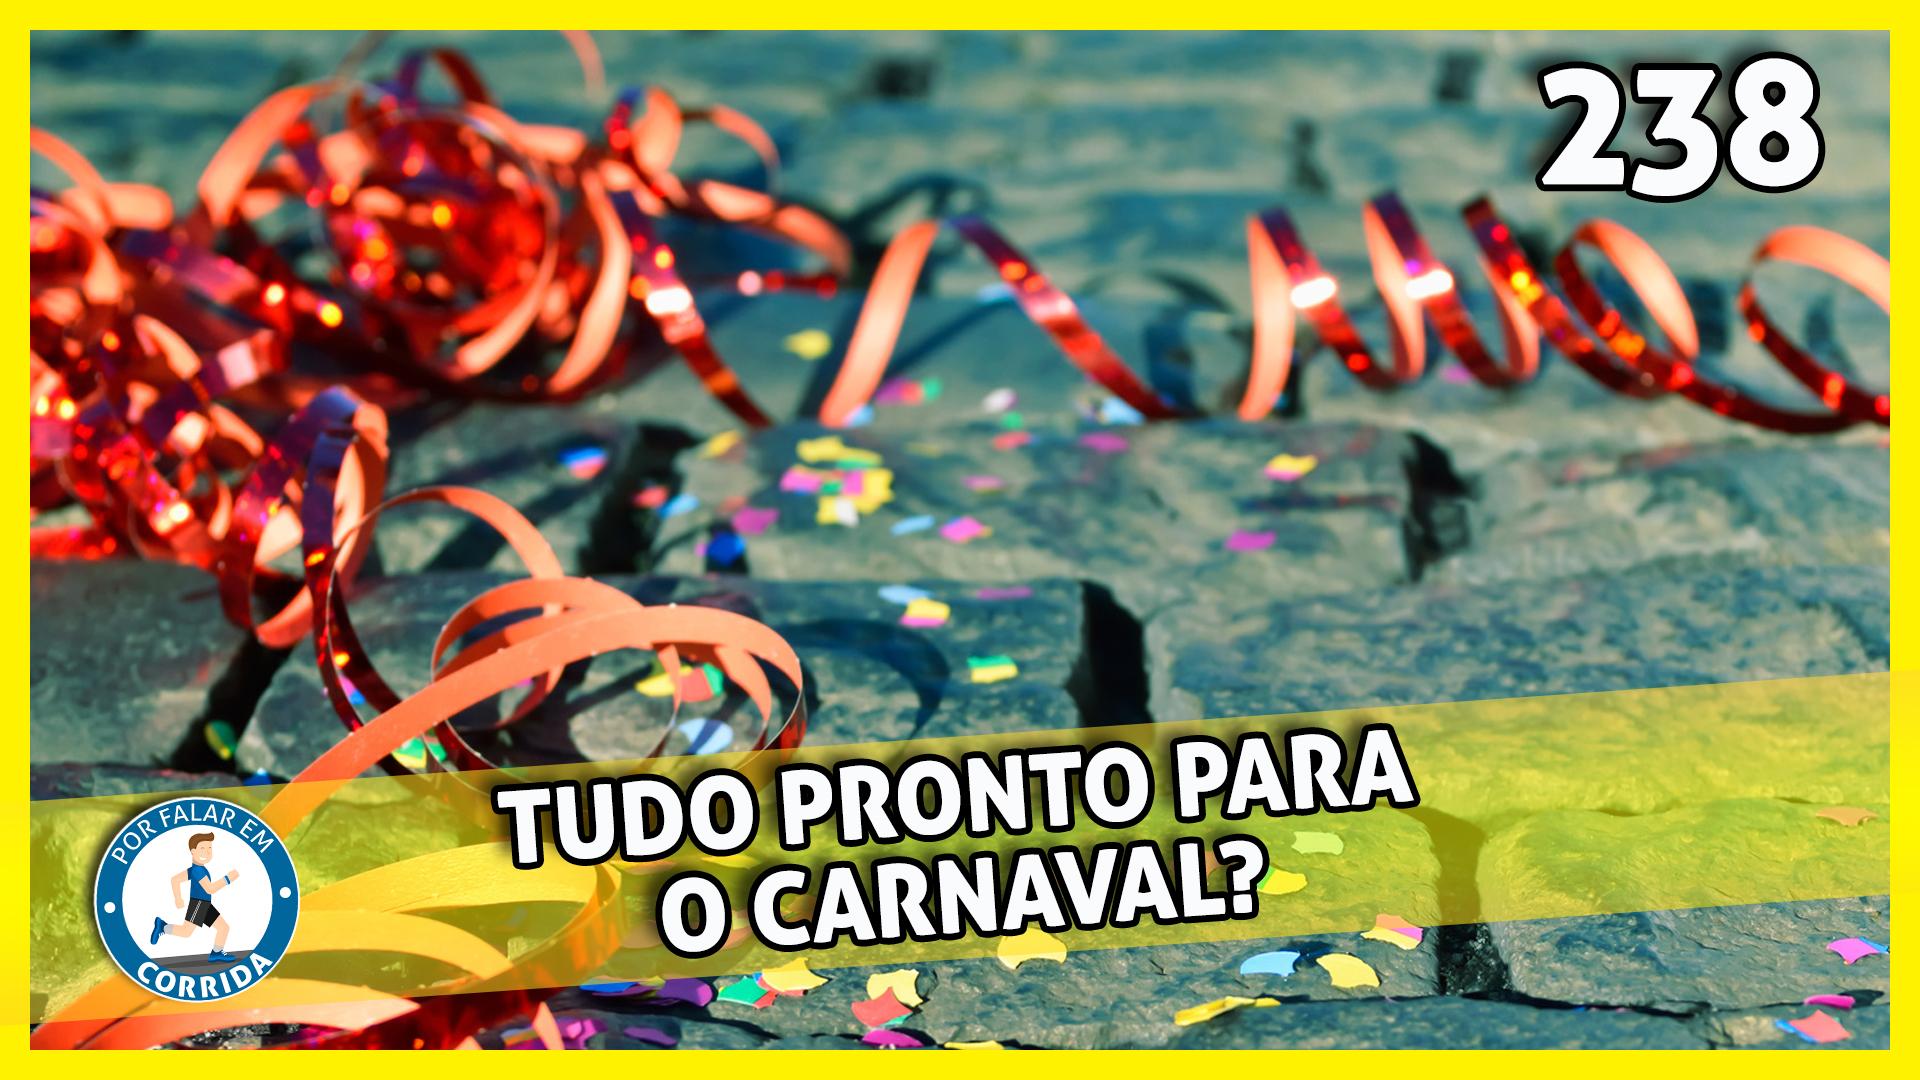 corrida e carnaval